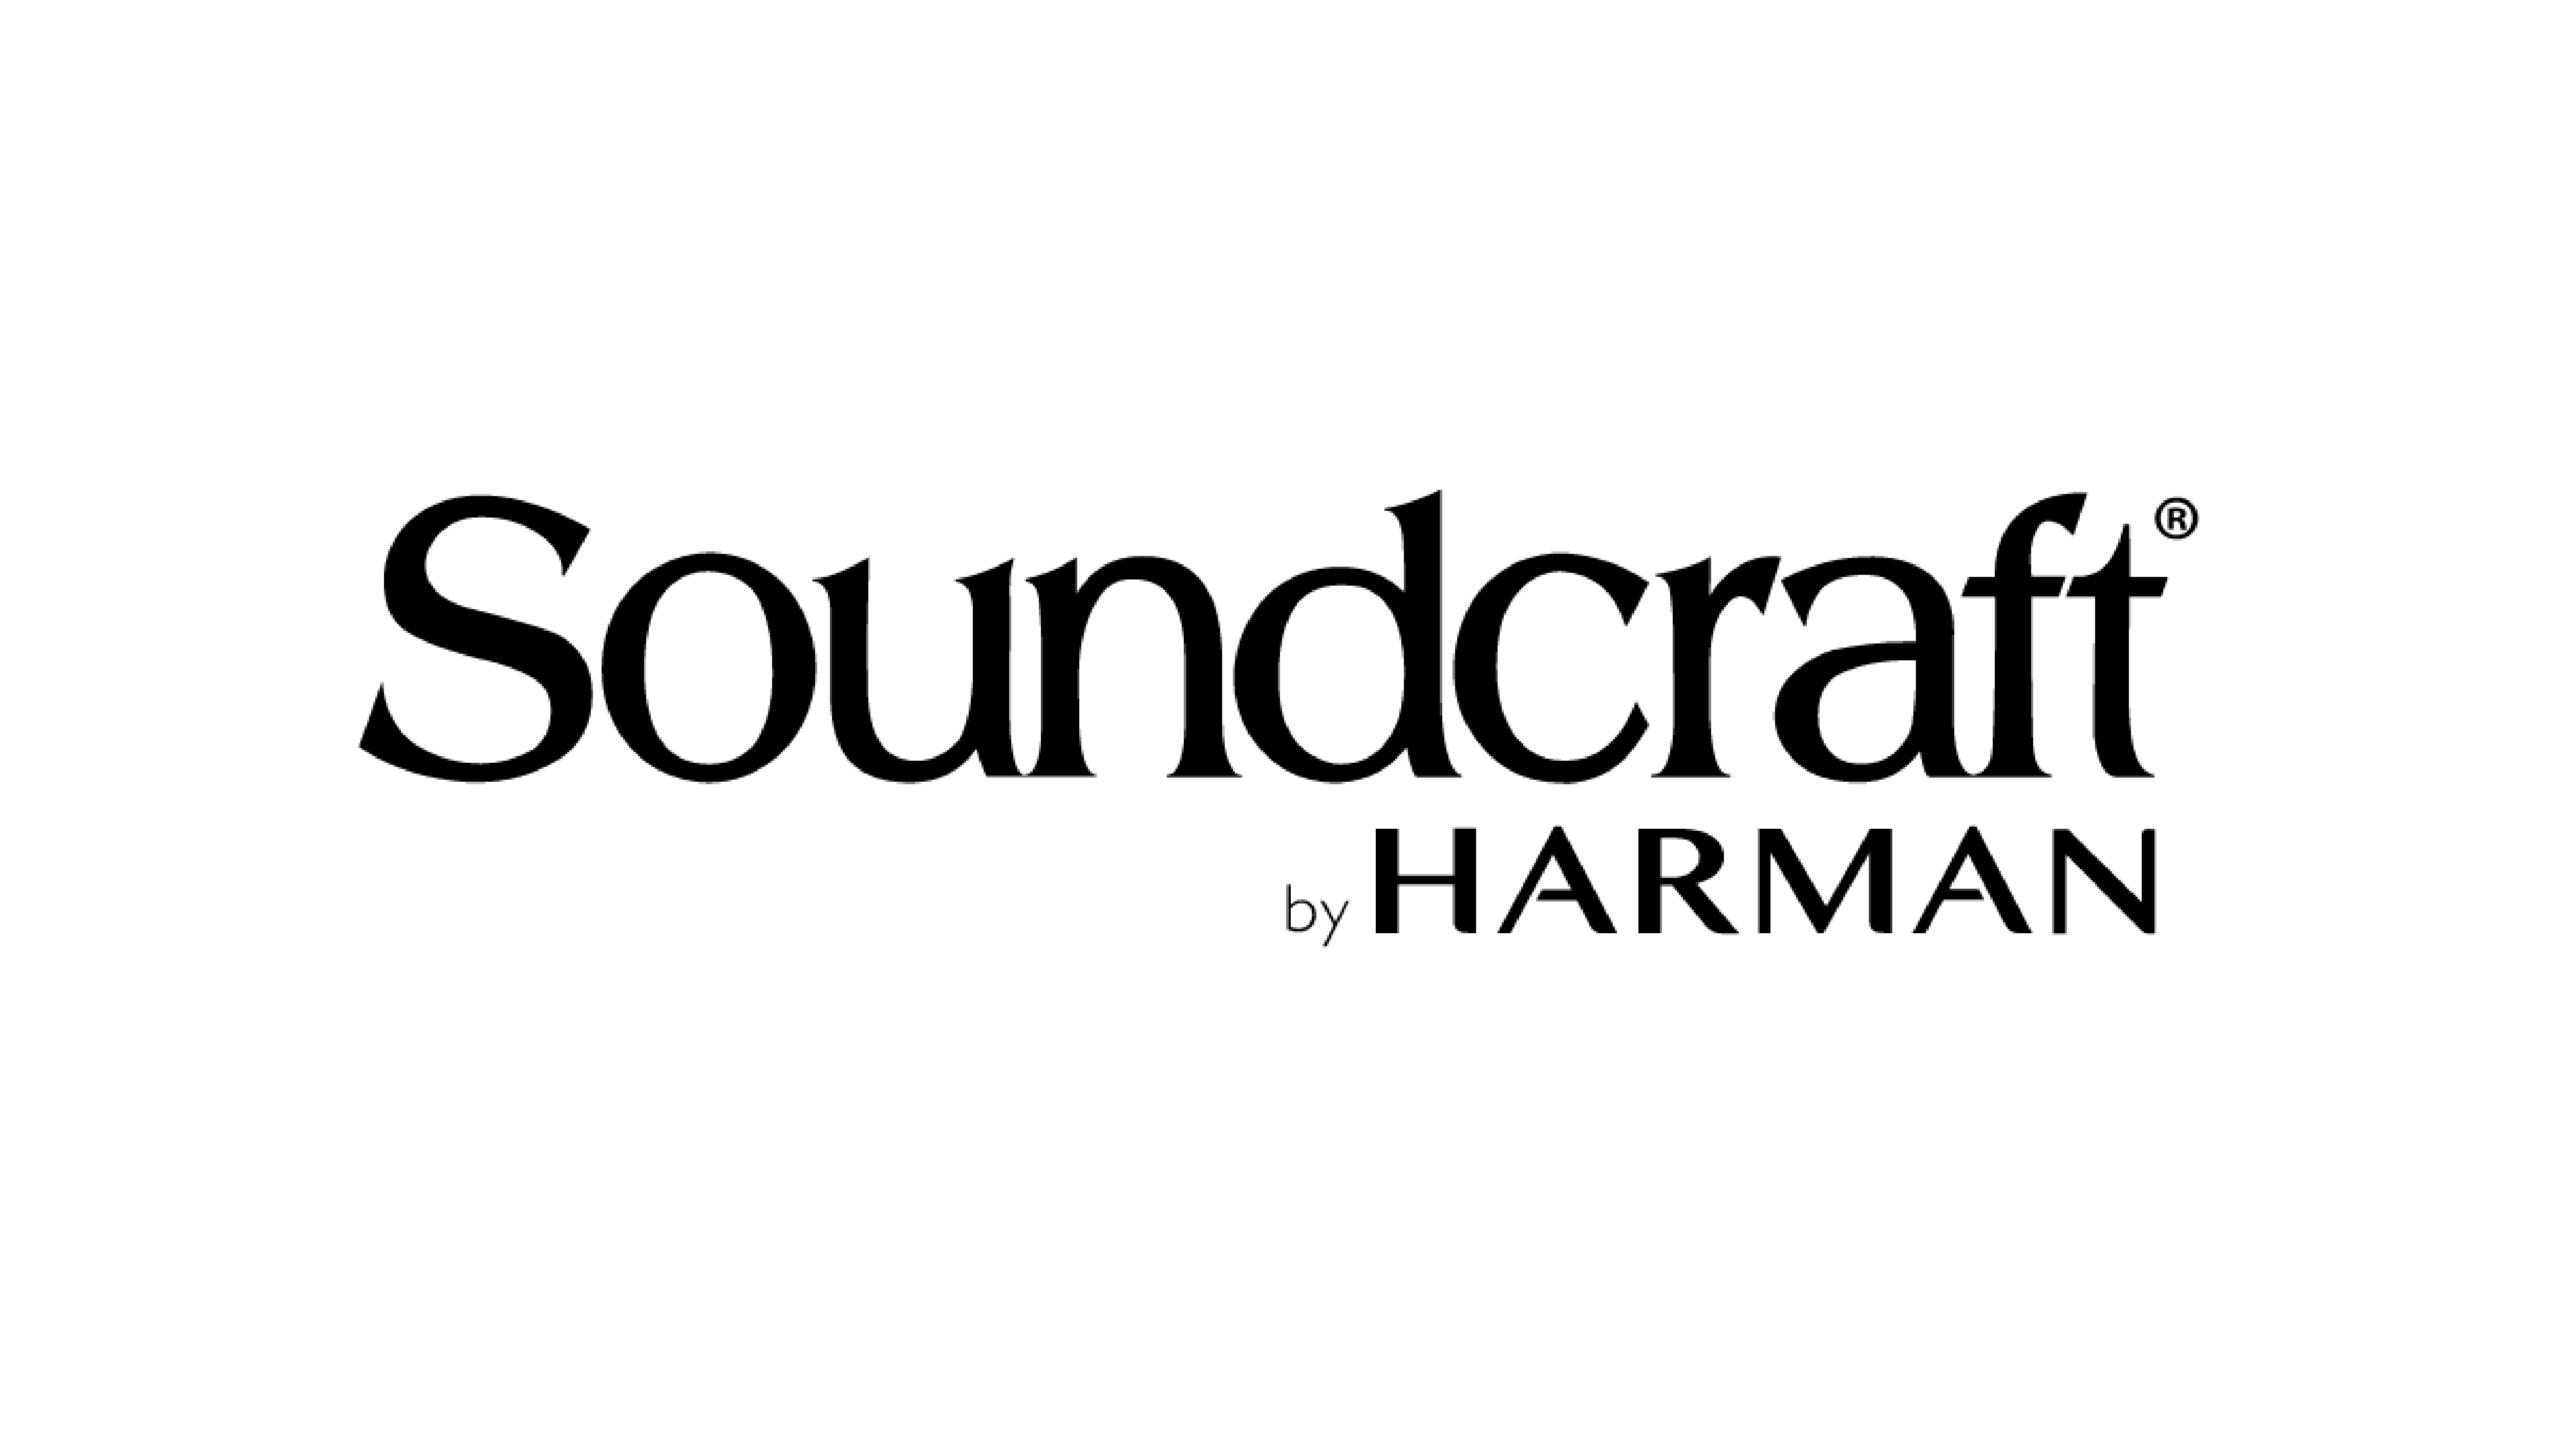 Soundcraft logo